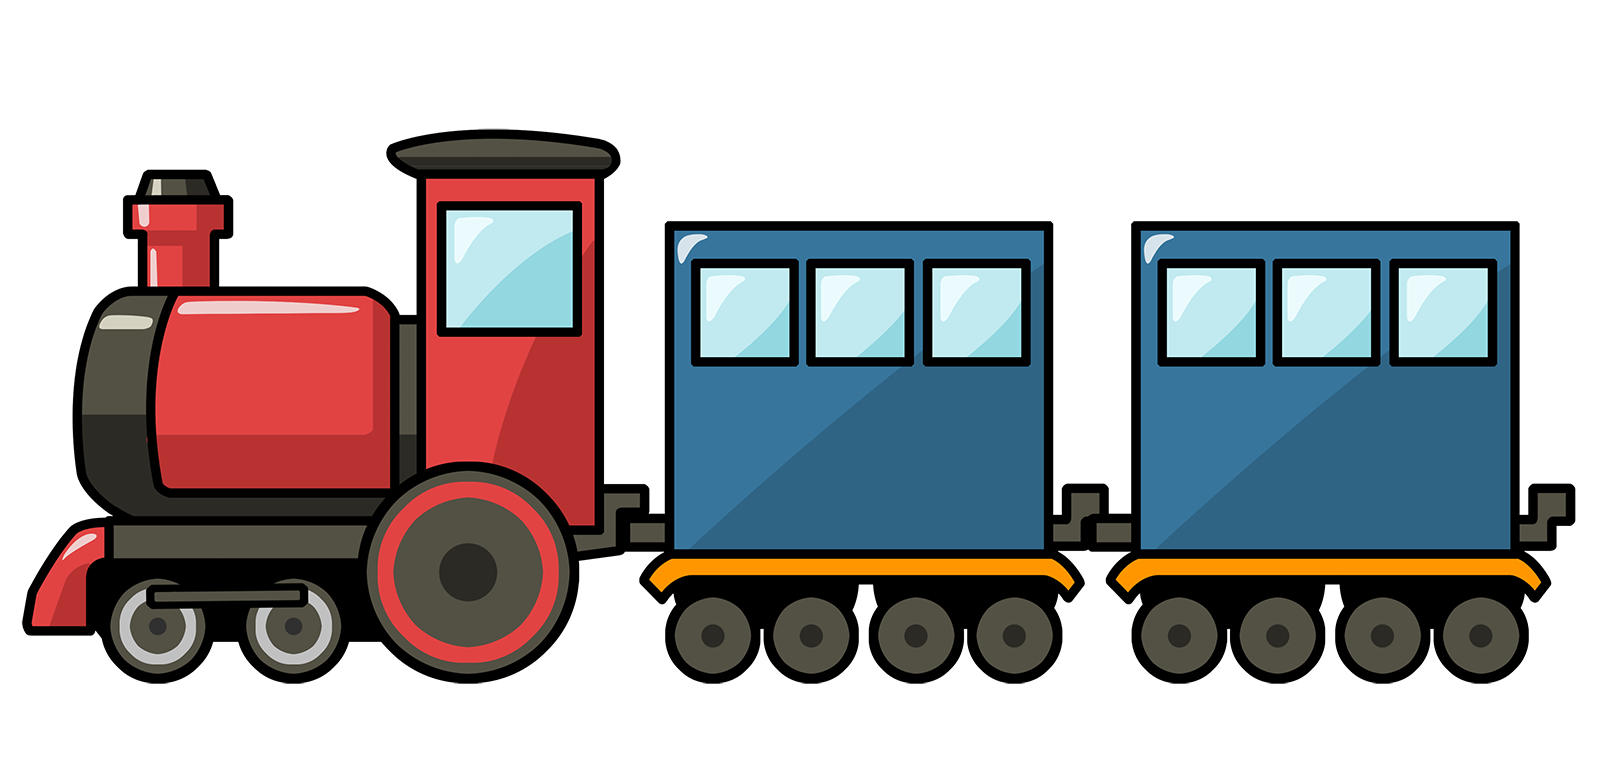 1600x783 Train Clipart Images